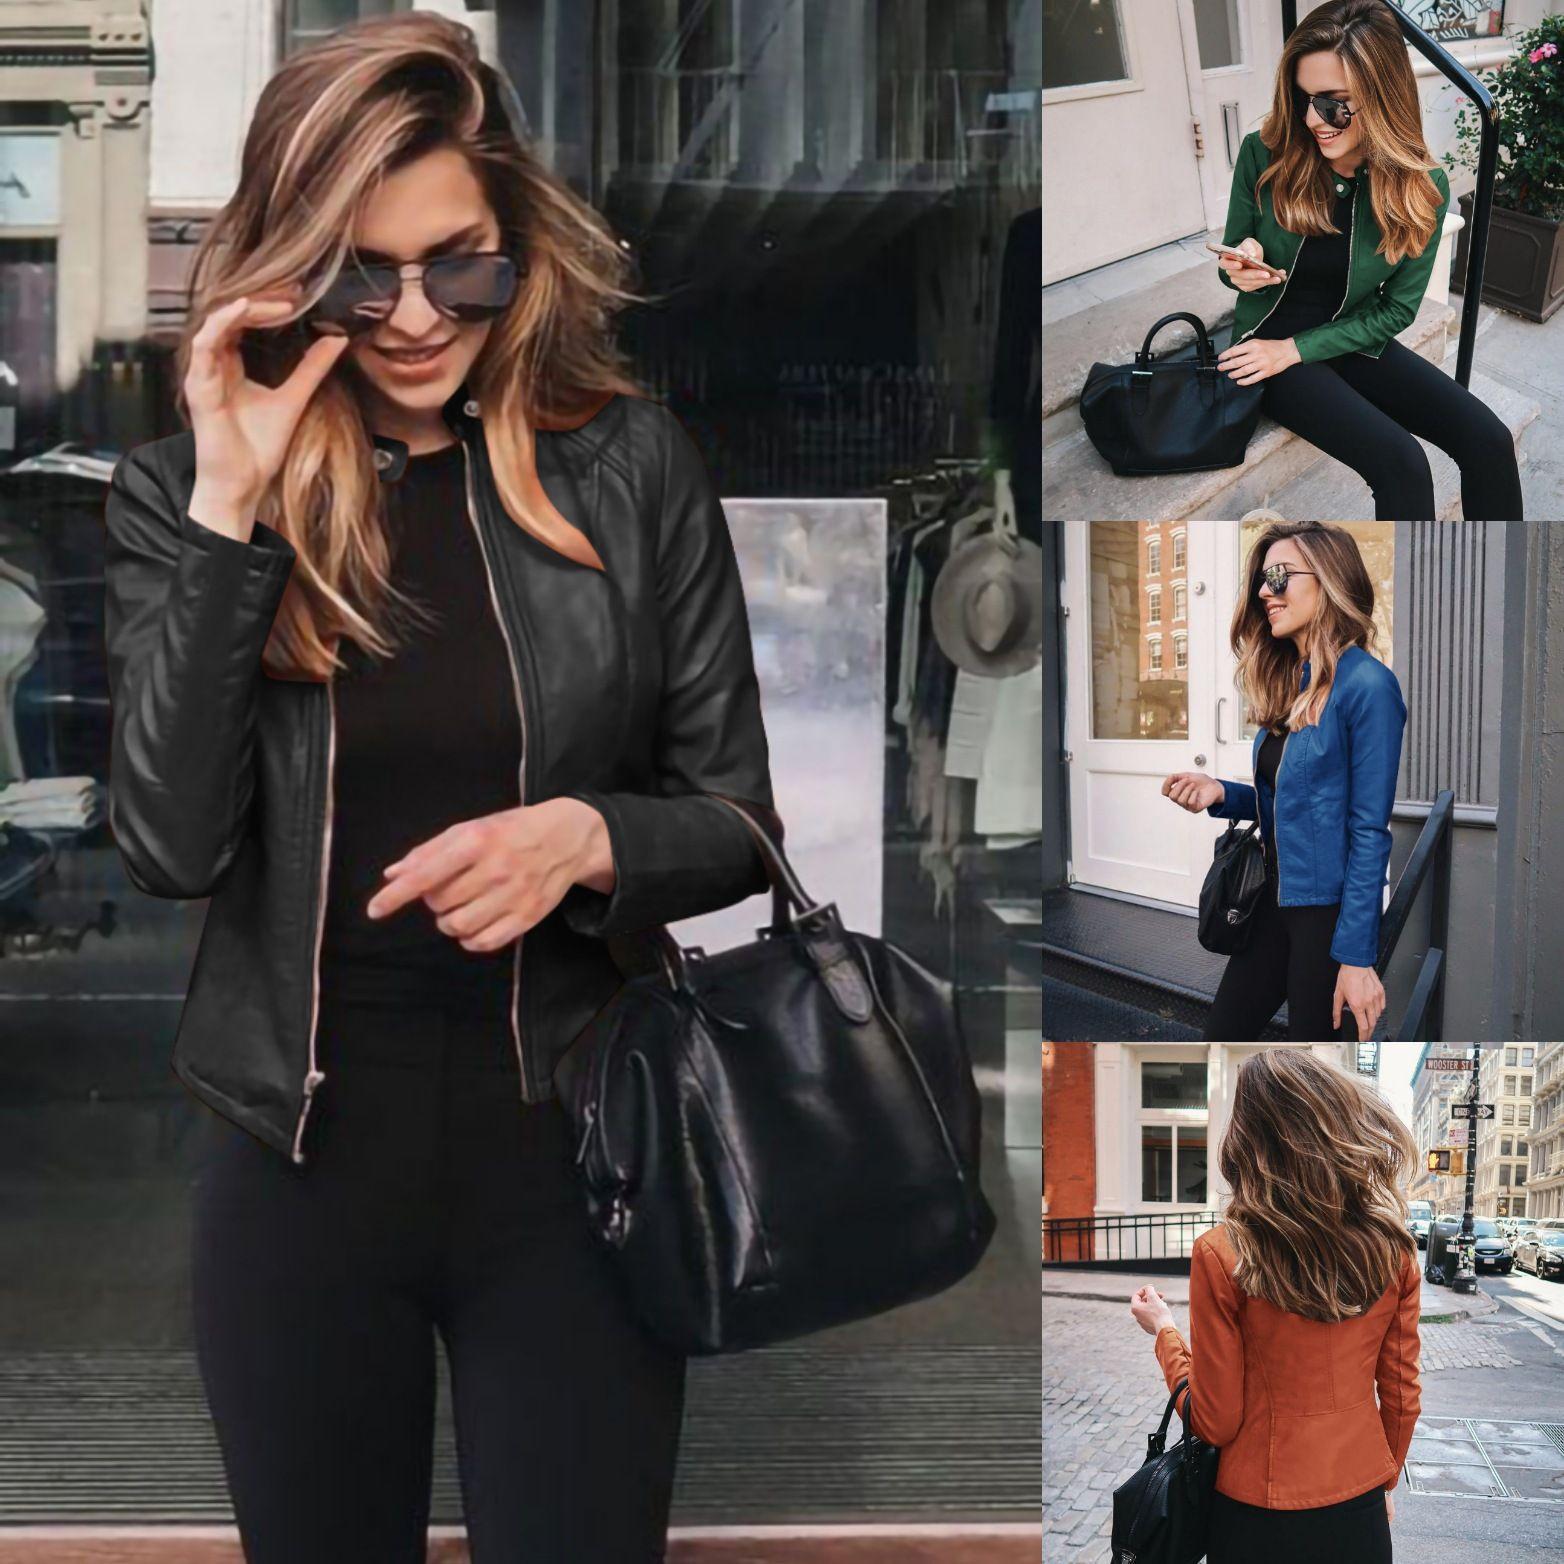 Winter Thicken Jacket Women Coat Jacket PU Leather Fashion Long Sleeve Coat Thick Warm Female Jacket Coat Outwear 2020